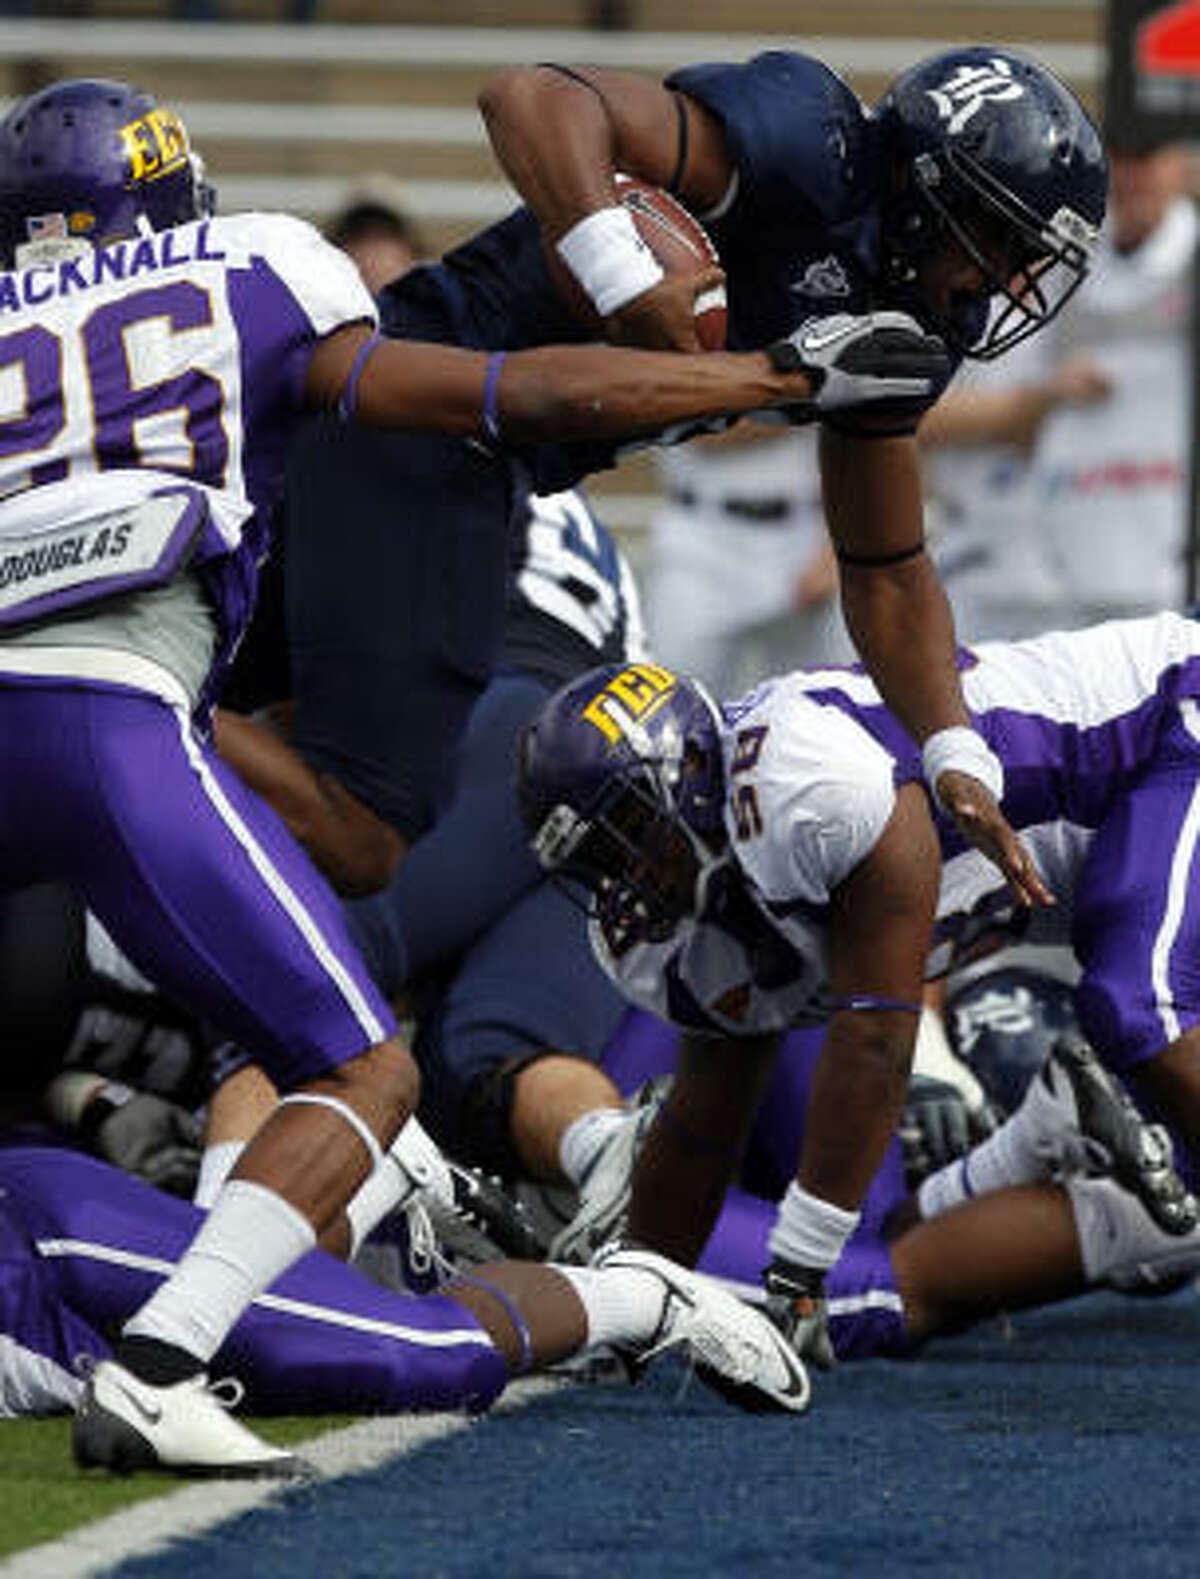 Jeremy Eddington records a touchdown in Rice's offensive outburst.